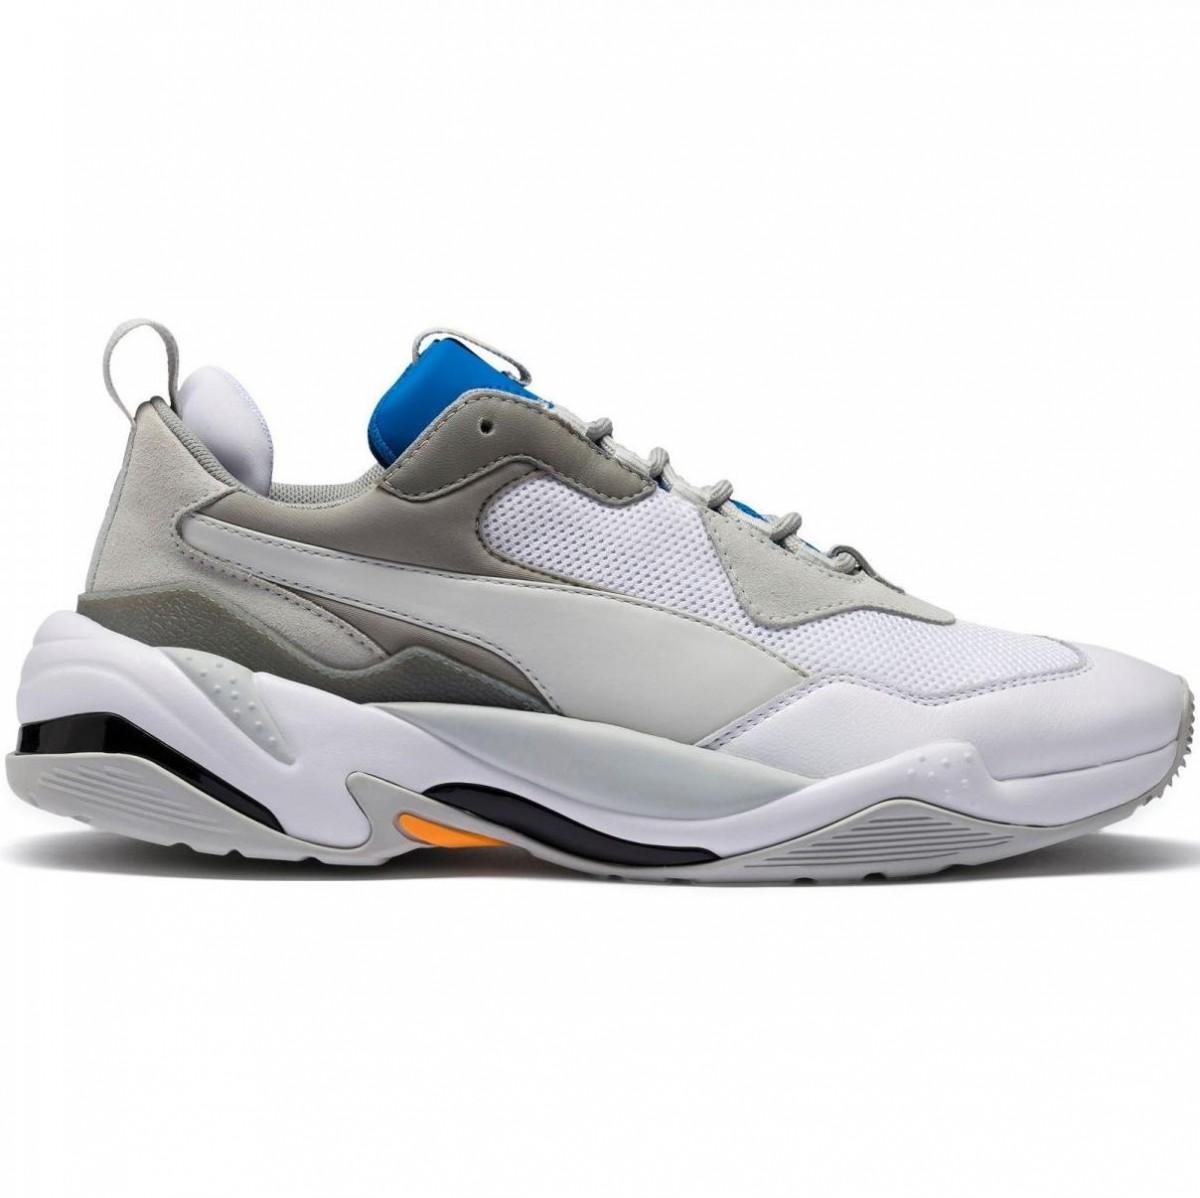 Puma Thunder Spectra Sneaker